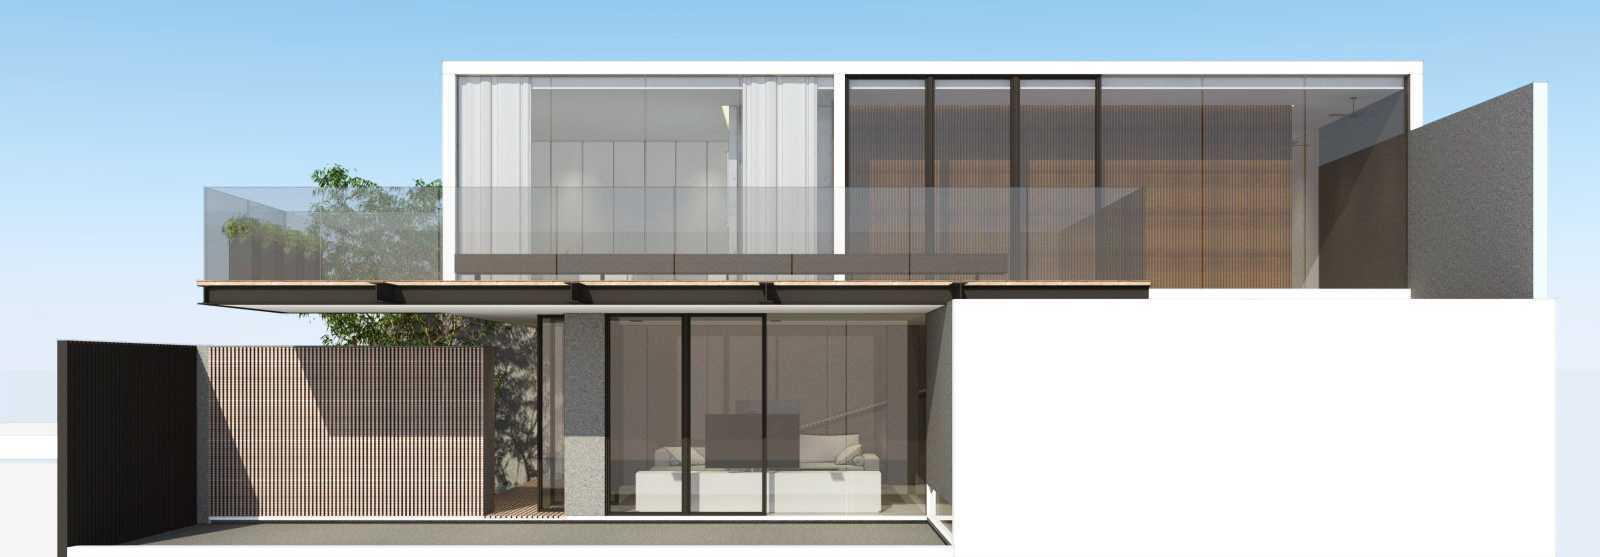 Ari Wibowo Design (Aw.d) Sn House Banten Banten 09Fn Modern  14534